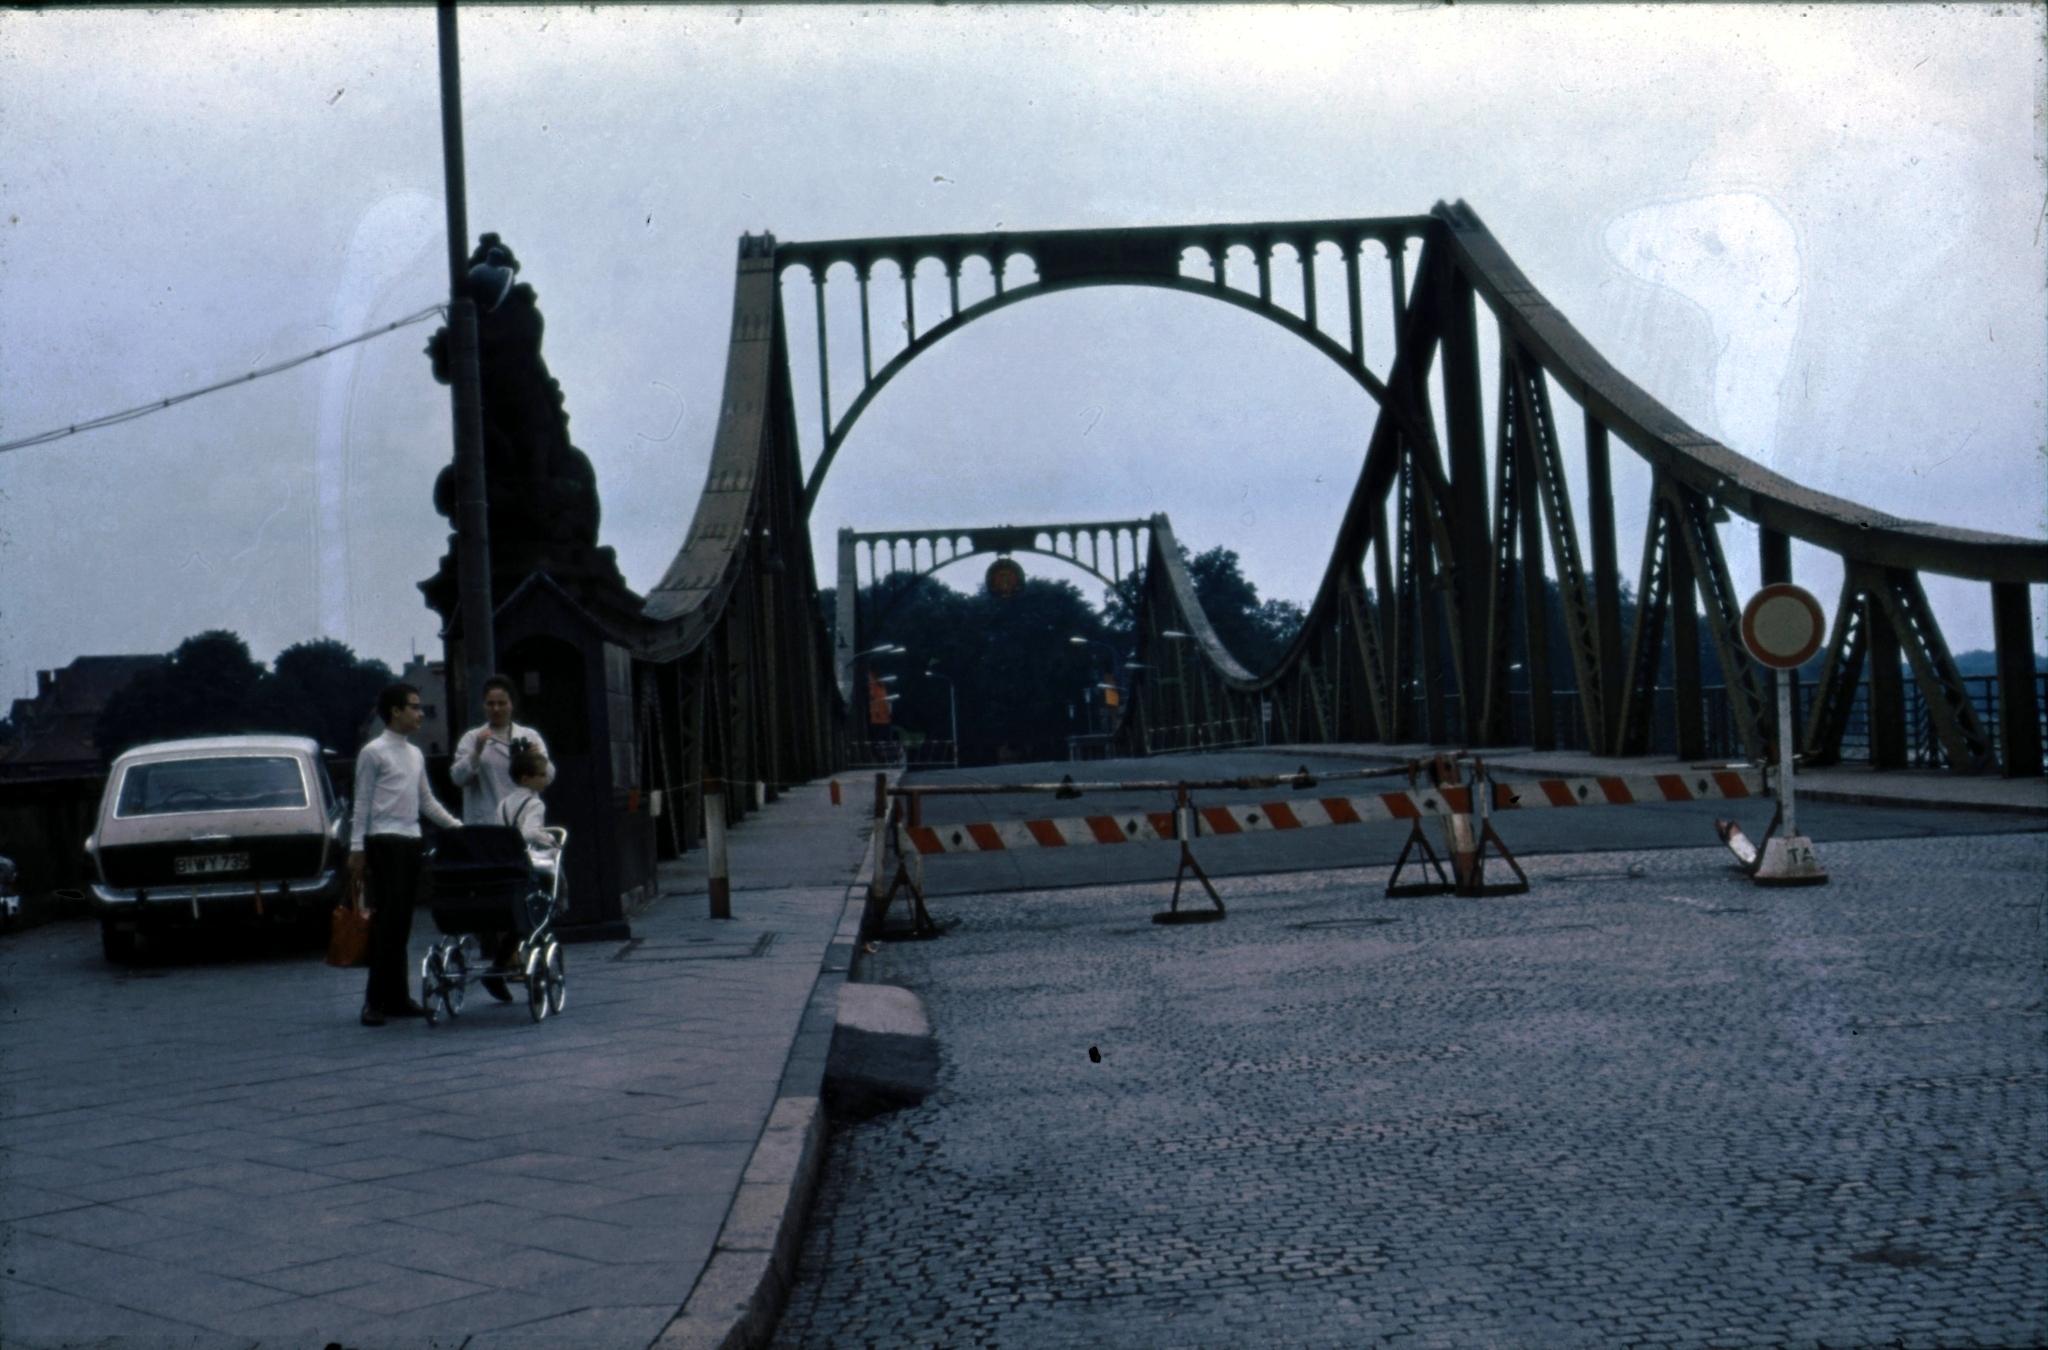 Die Berliner Mauer um 1973 - Berlin Wall - Daniel Rohde-Kage 54